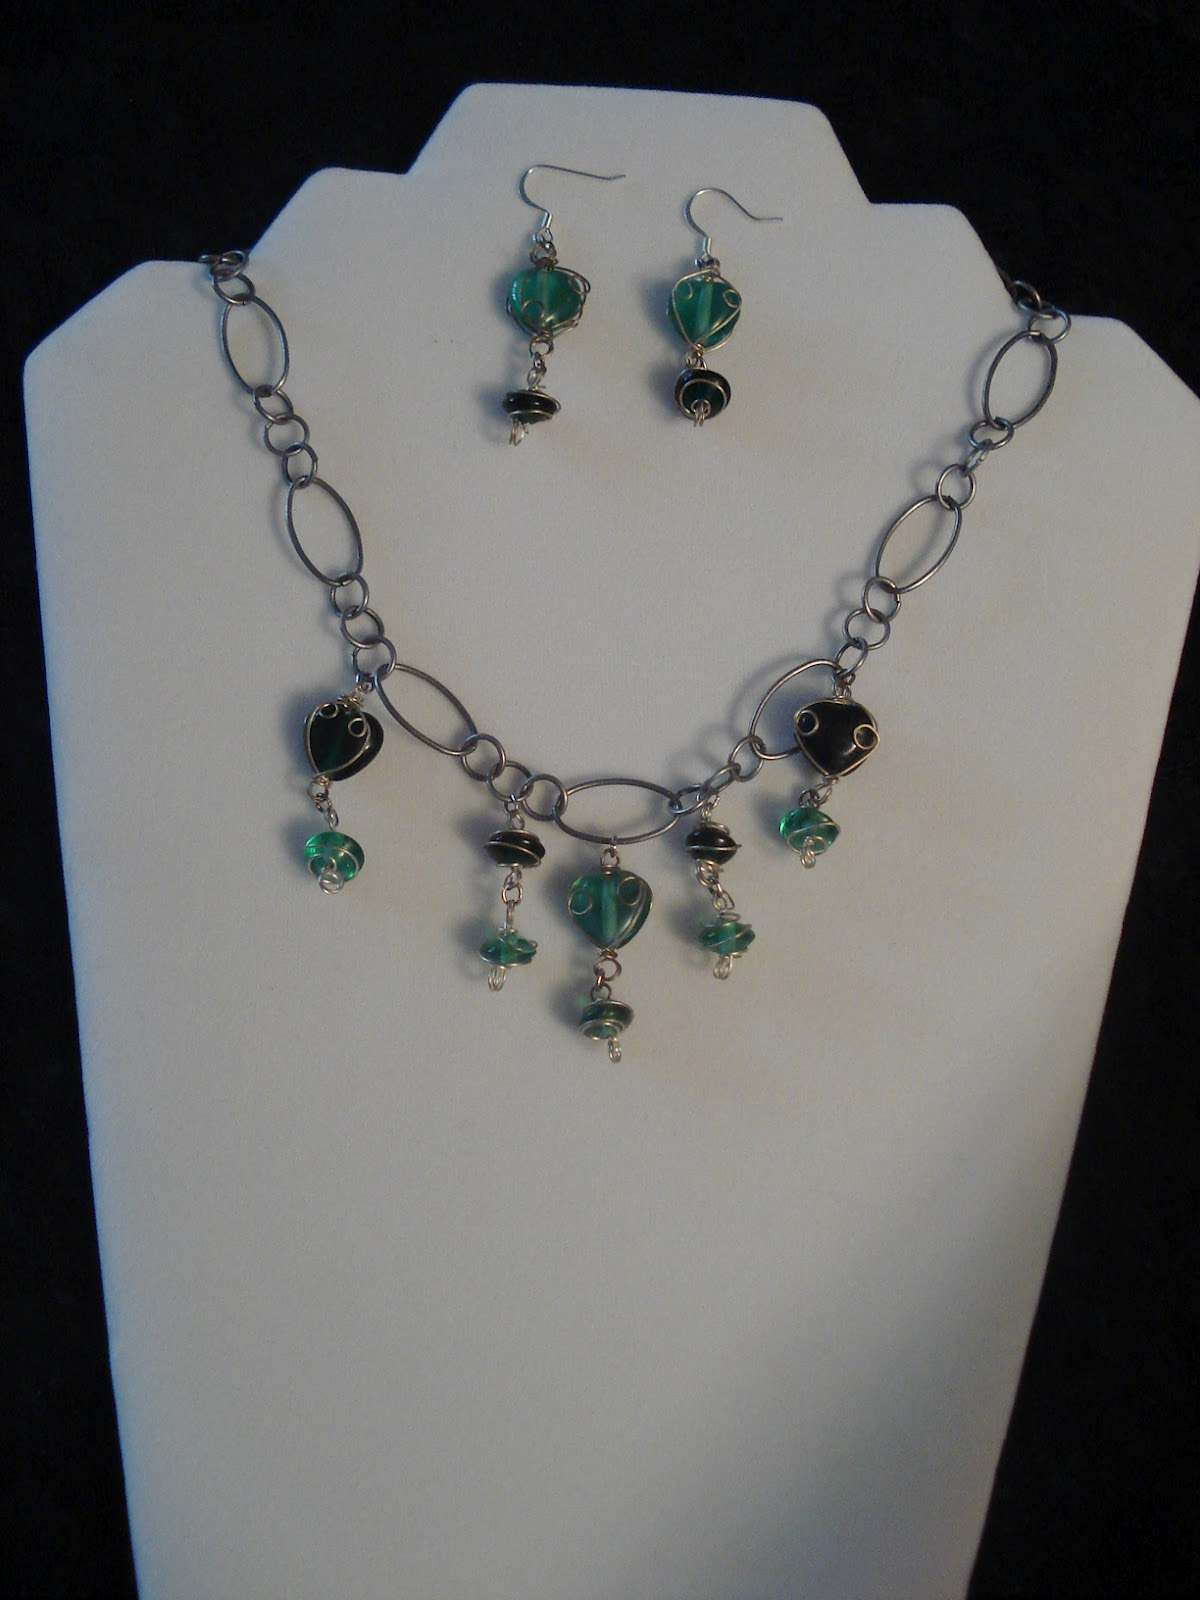 Gemzz4U, Handmade Jewelry, Necklaces, Earrings, Bracelets ...